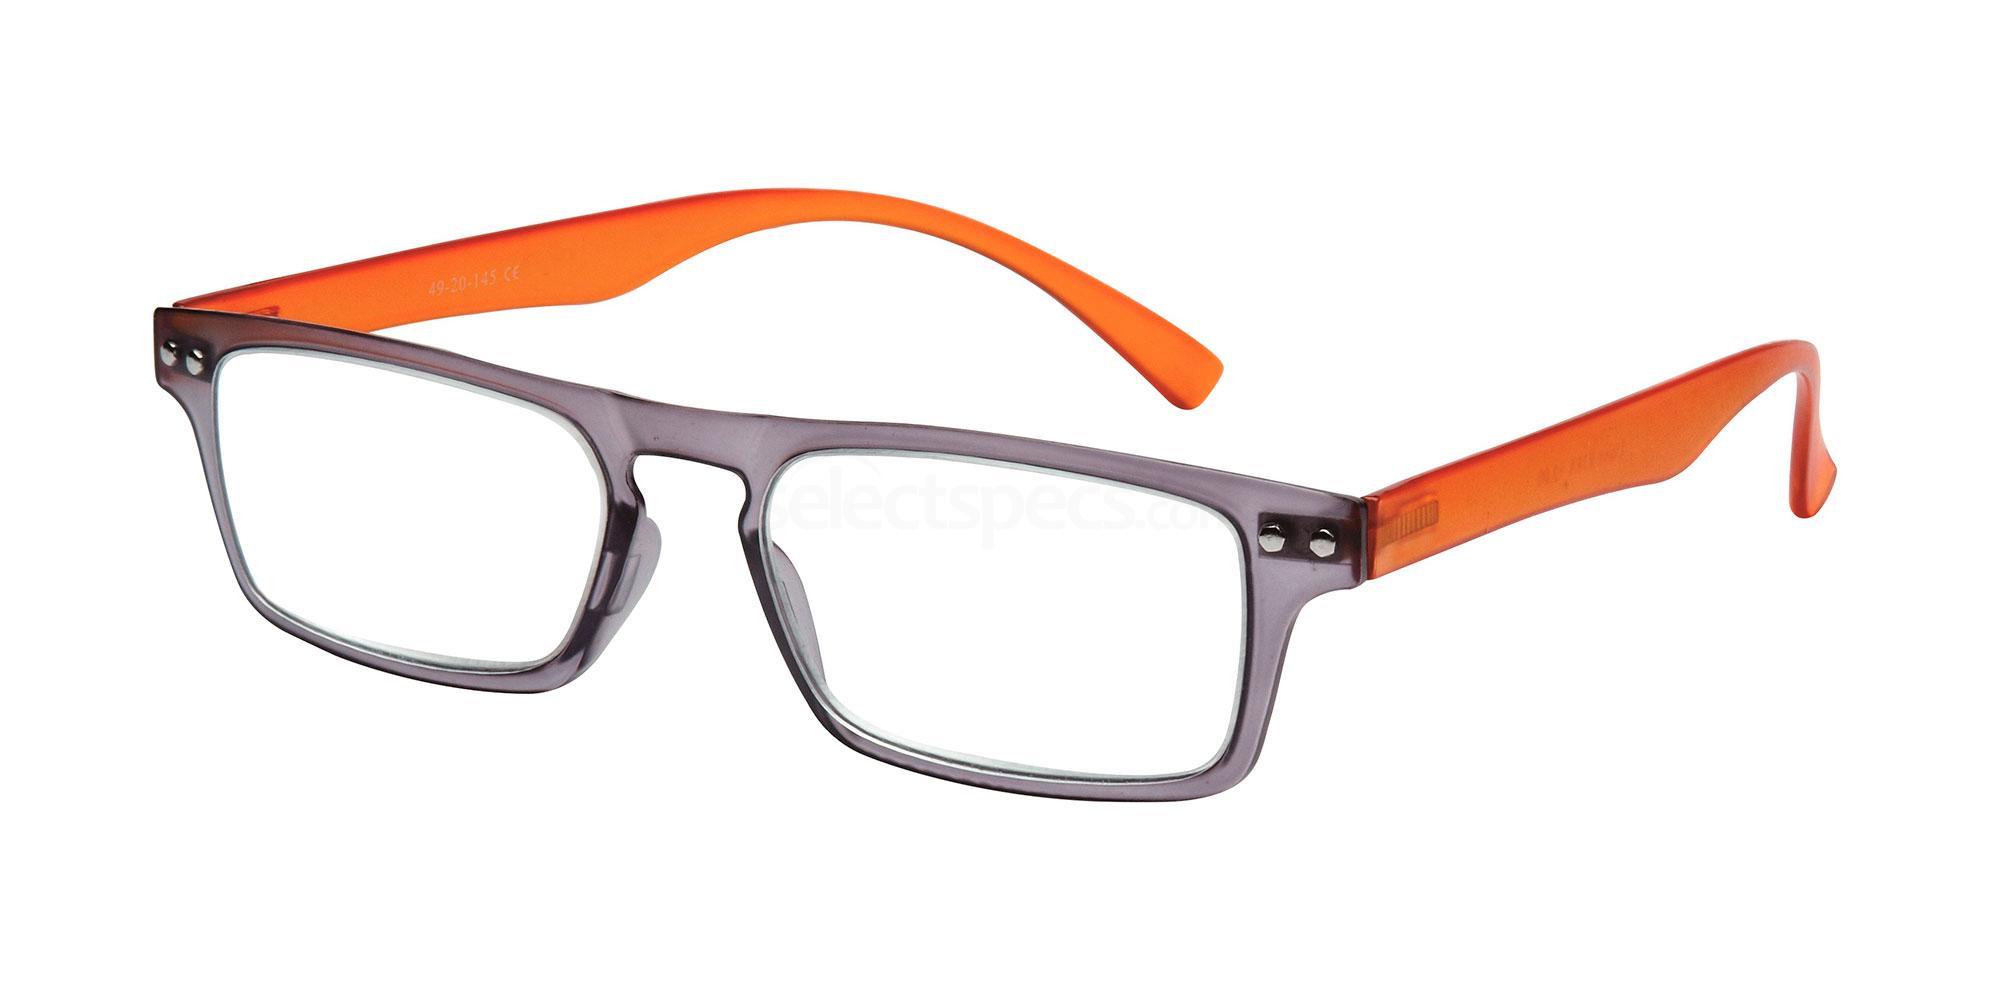 +1.50 Power Readers R18A - A: Grey/Orange Accessories, Univo Readers